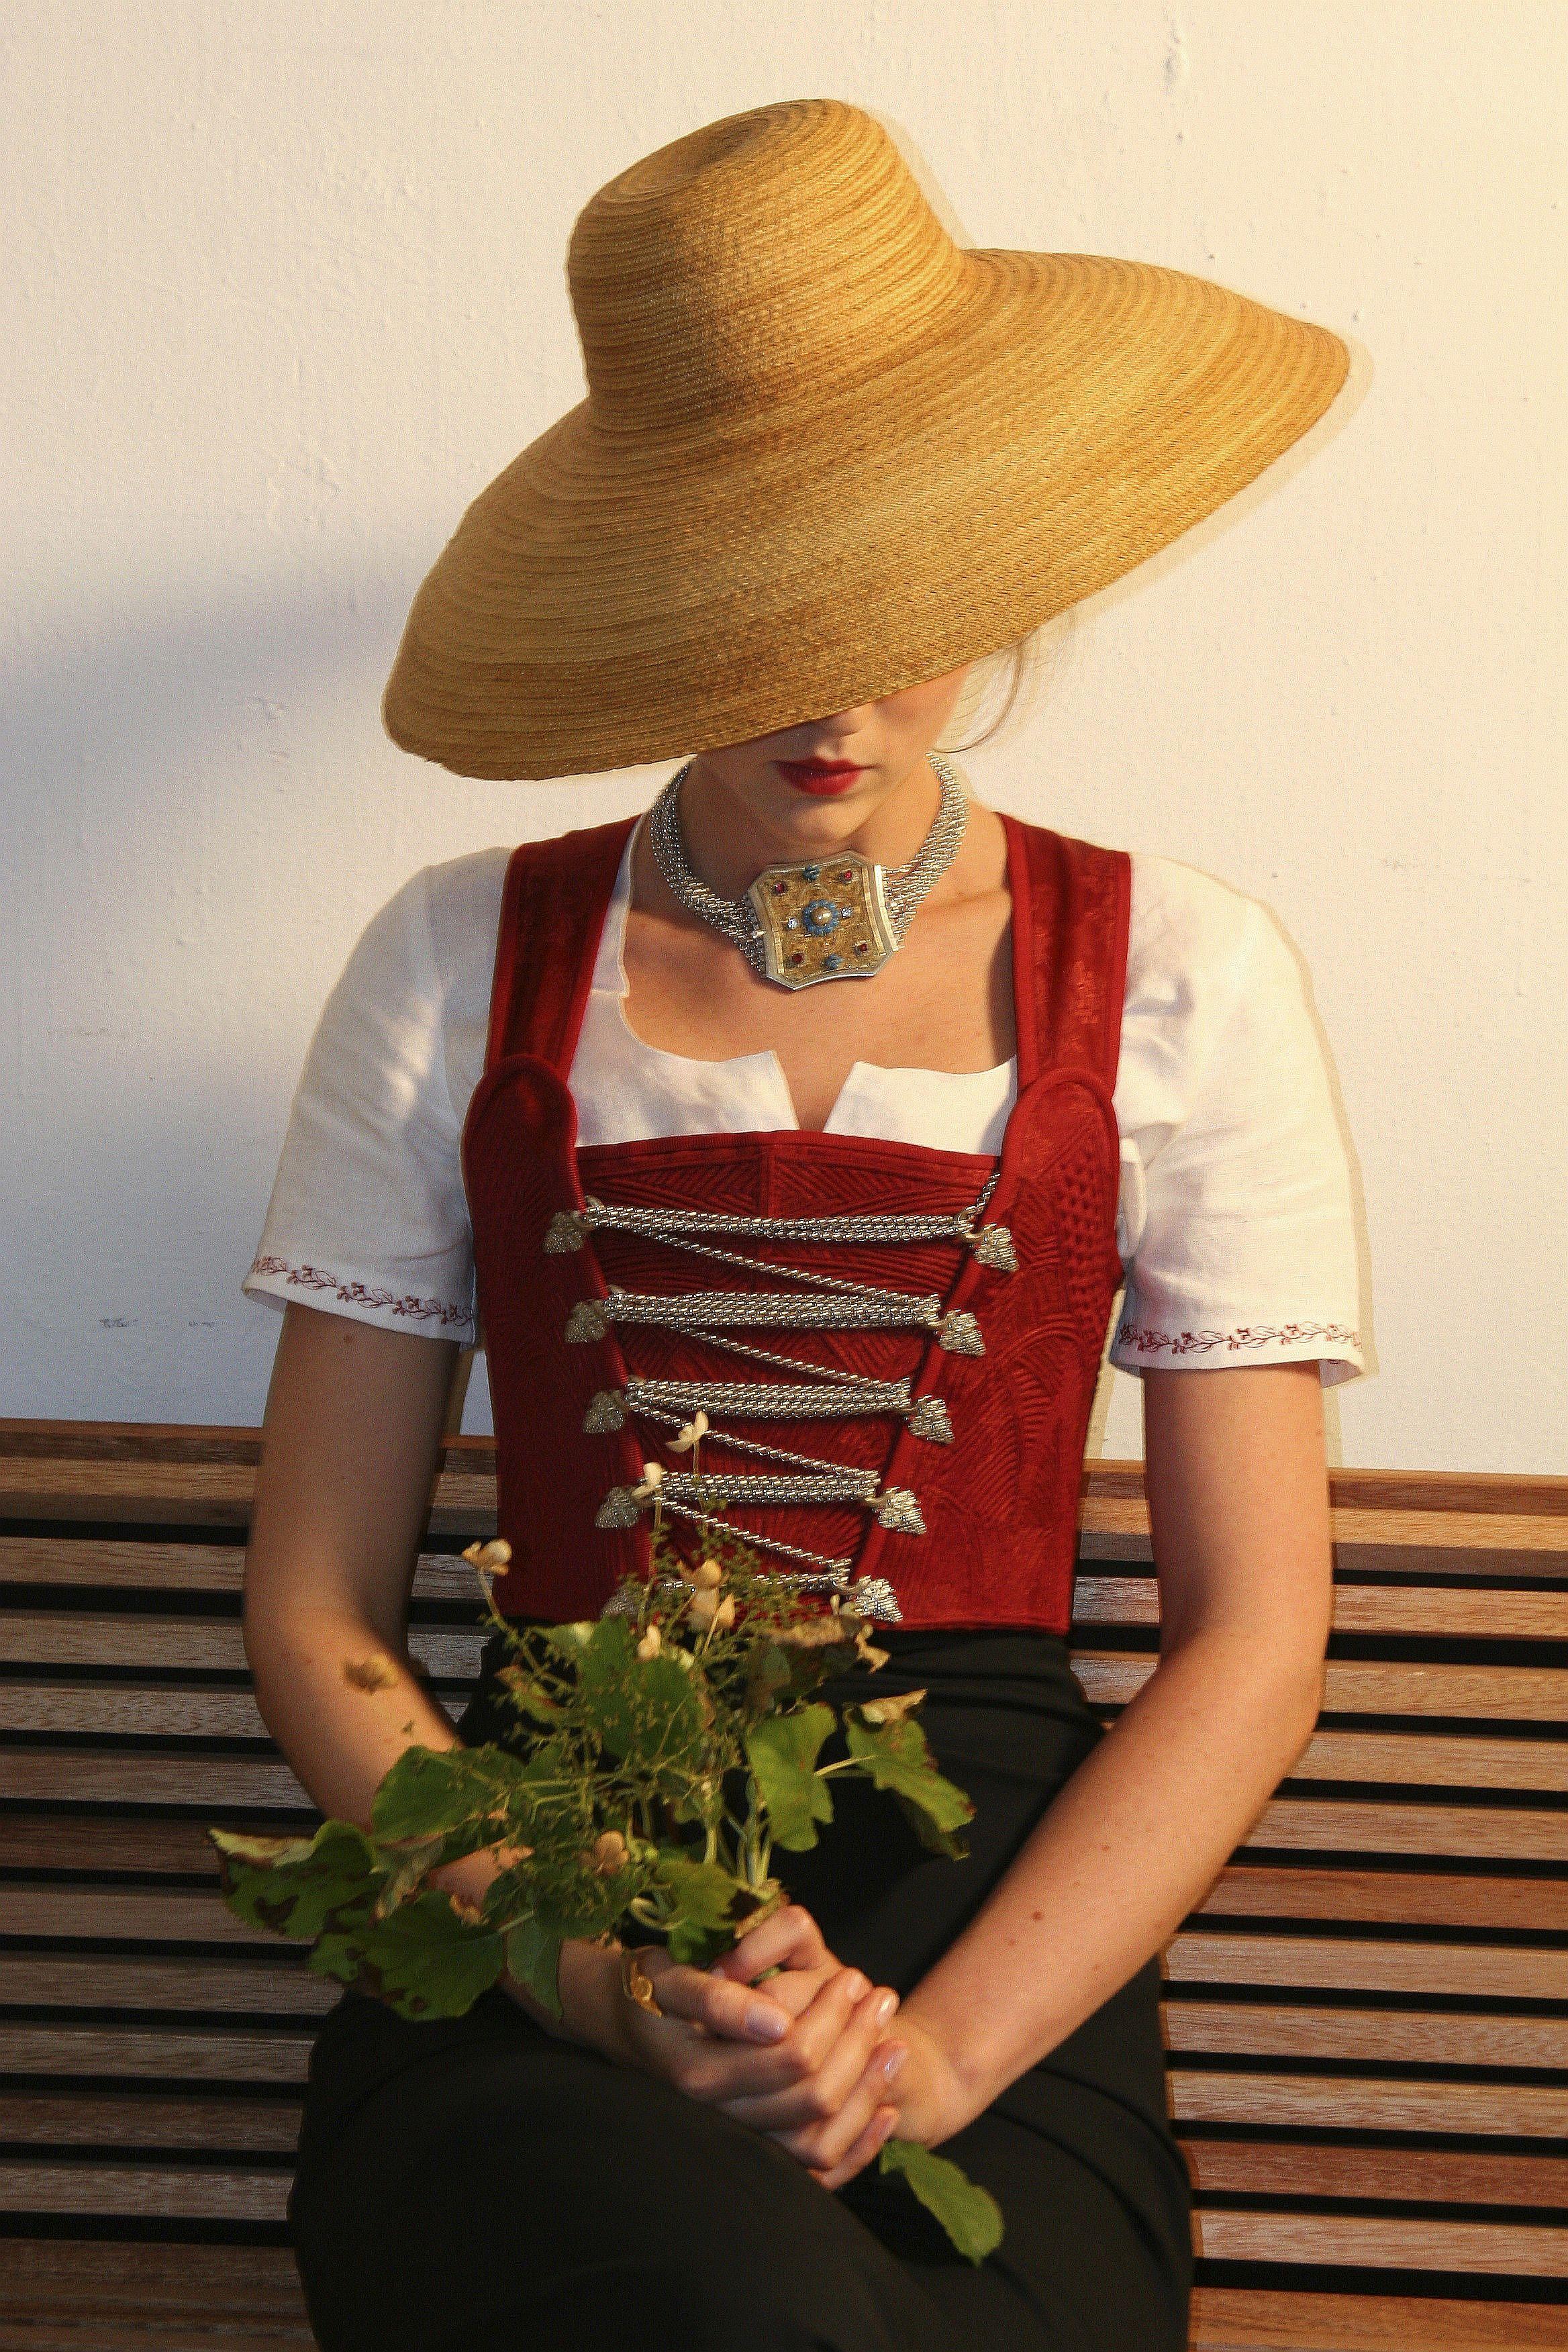 www.evavioletta.com